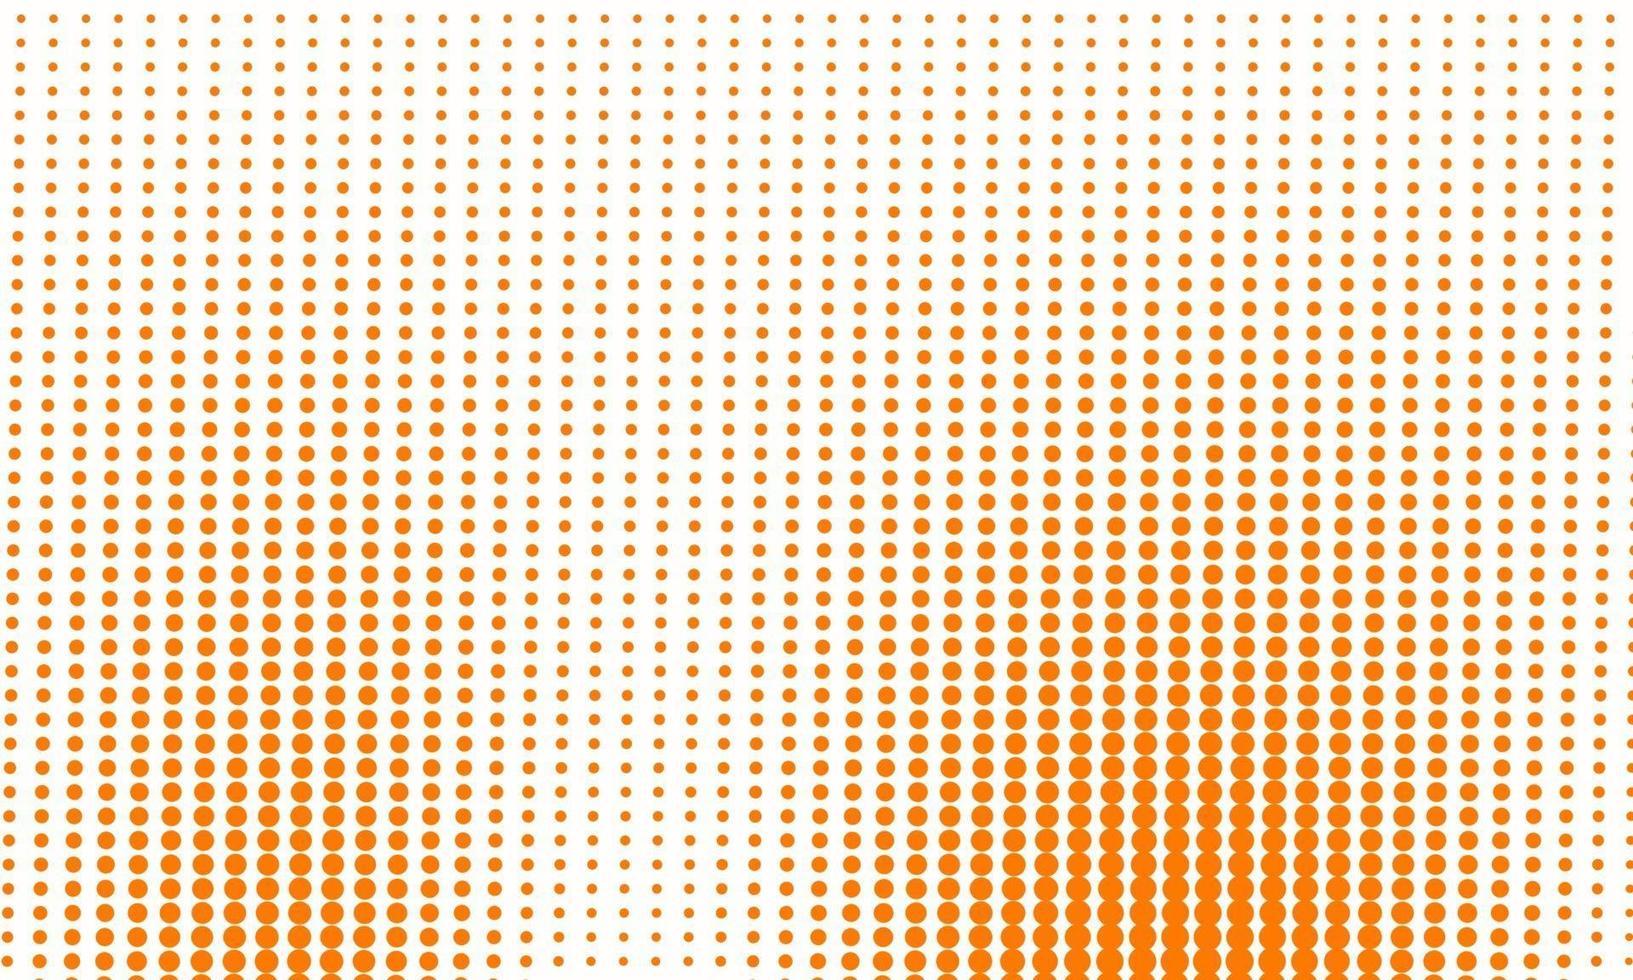 Abstract Orange Halftone Pattern vector